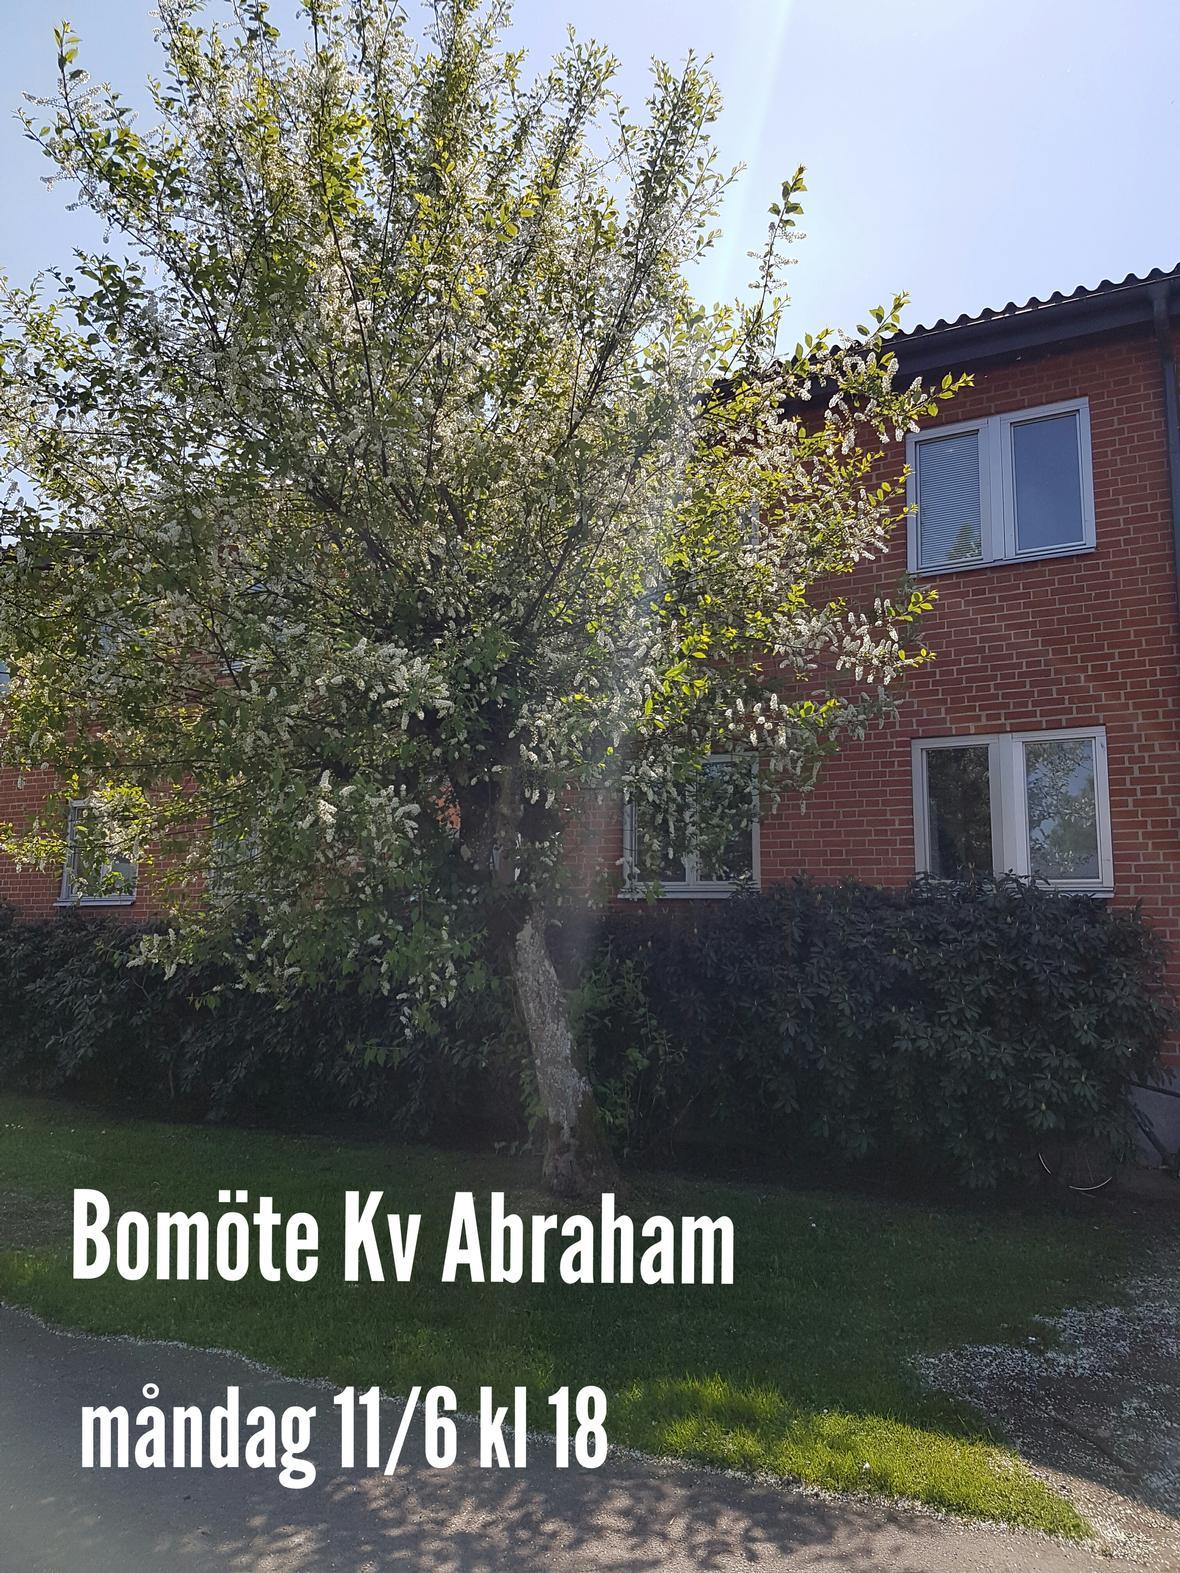 Bomote-Abraham.jpg